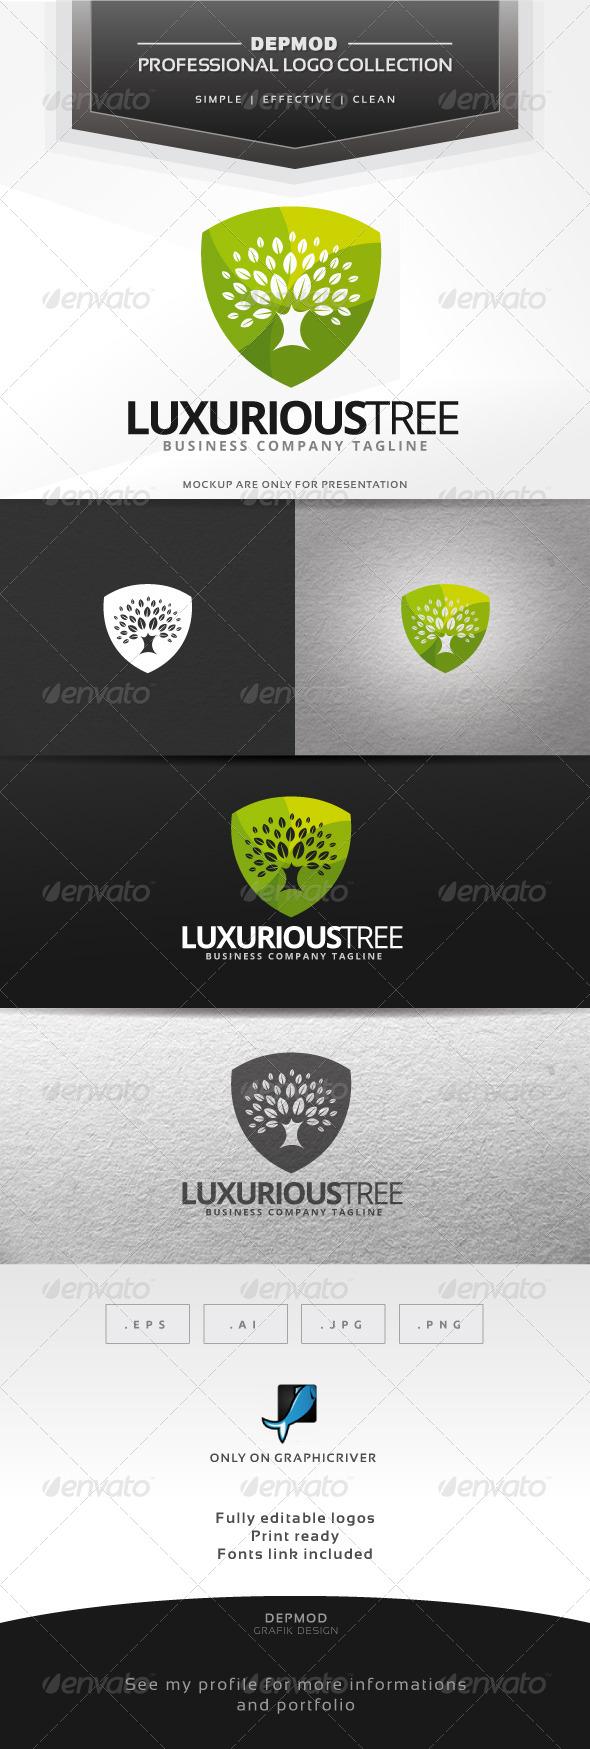 GraphicRiver Luxurious Tree Logo 7376709